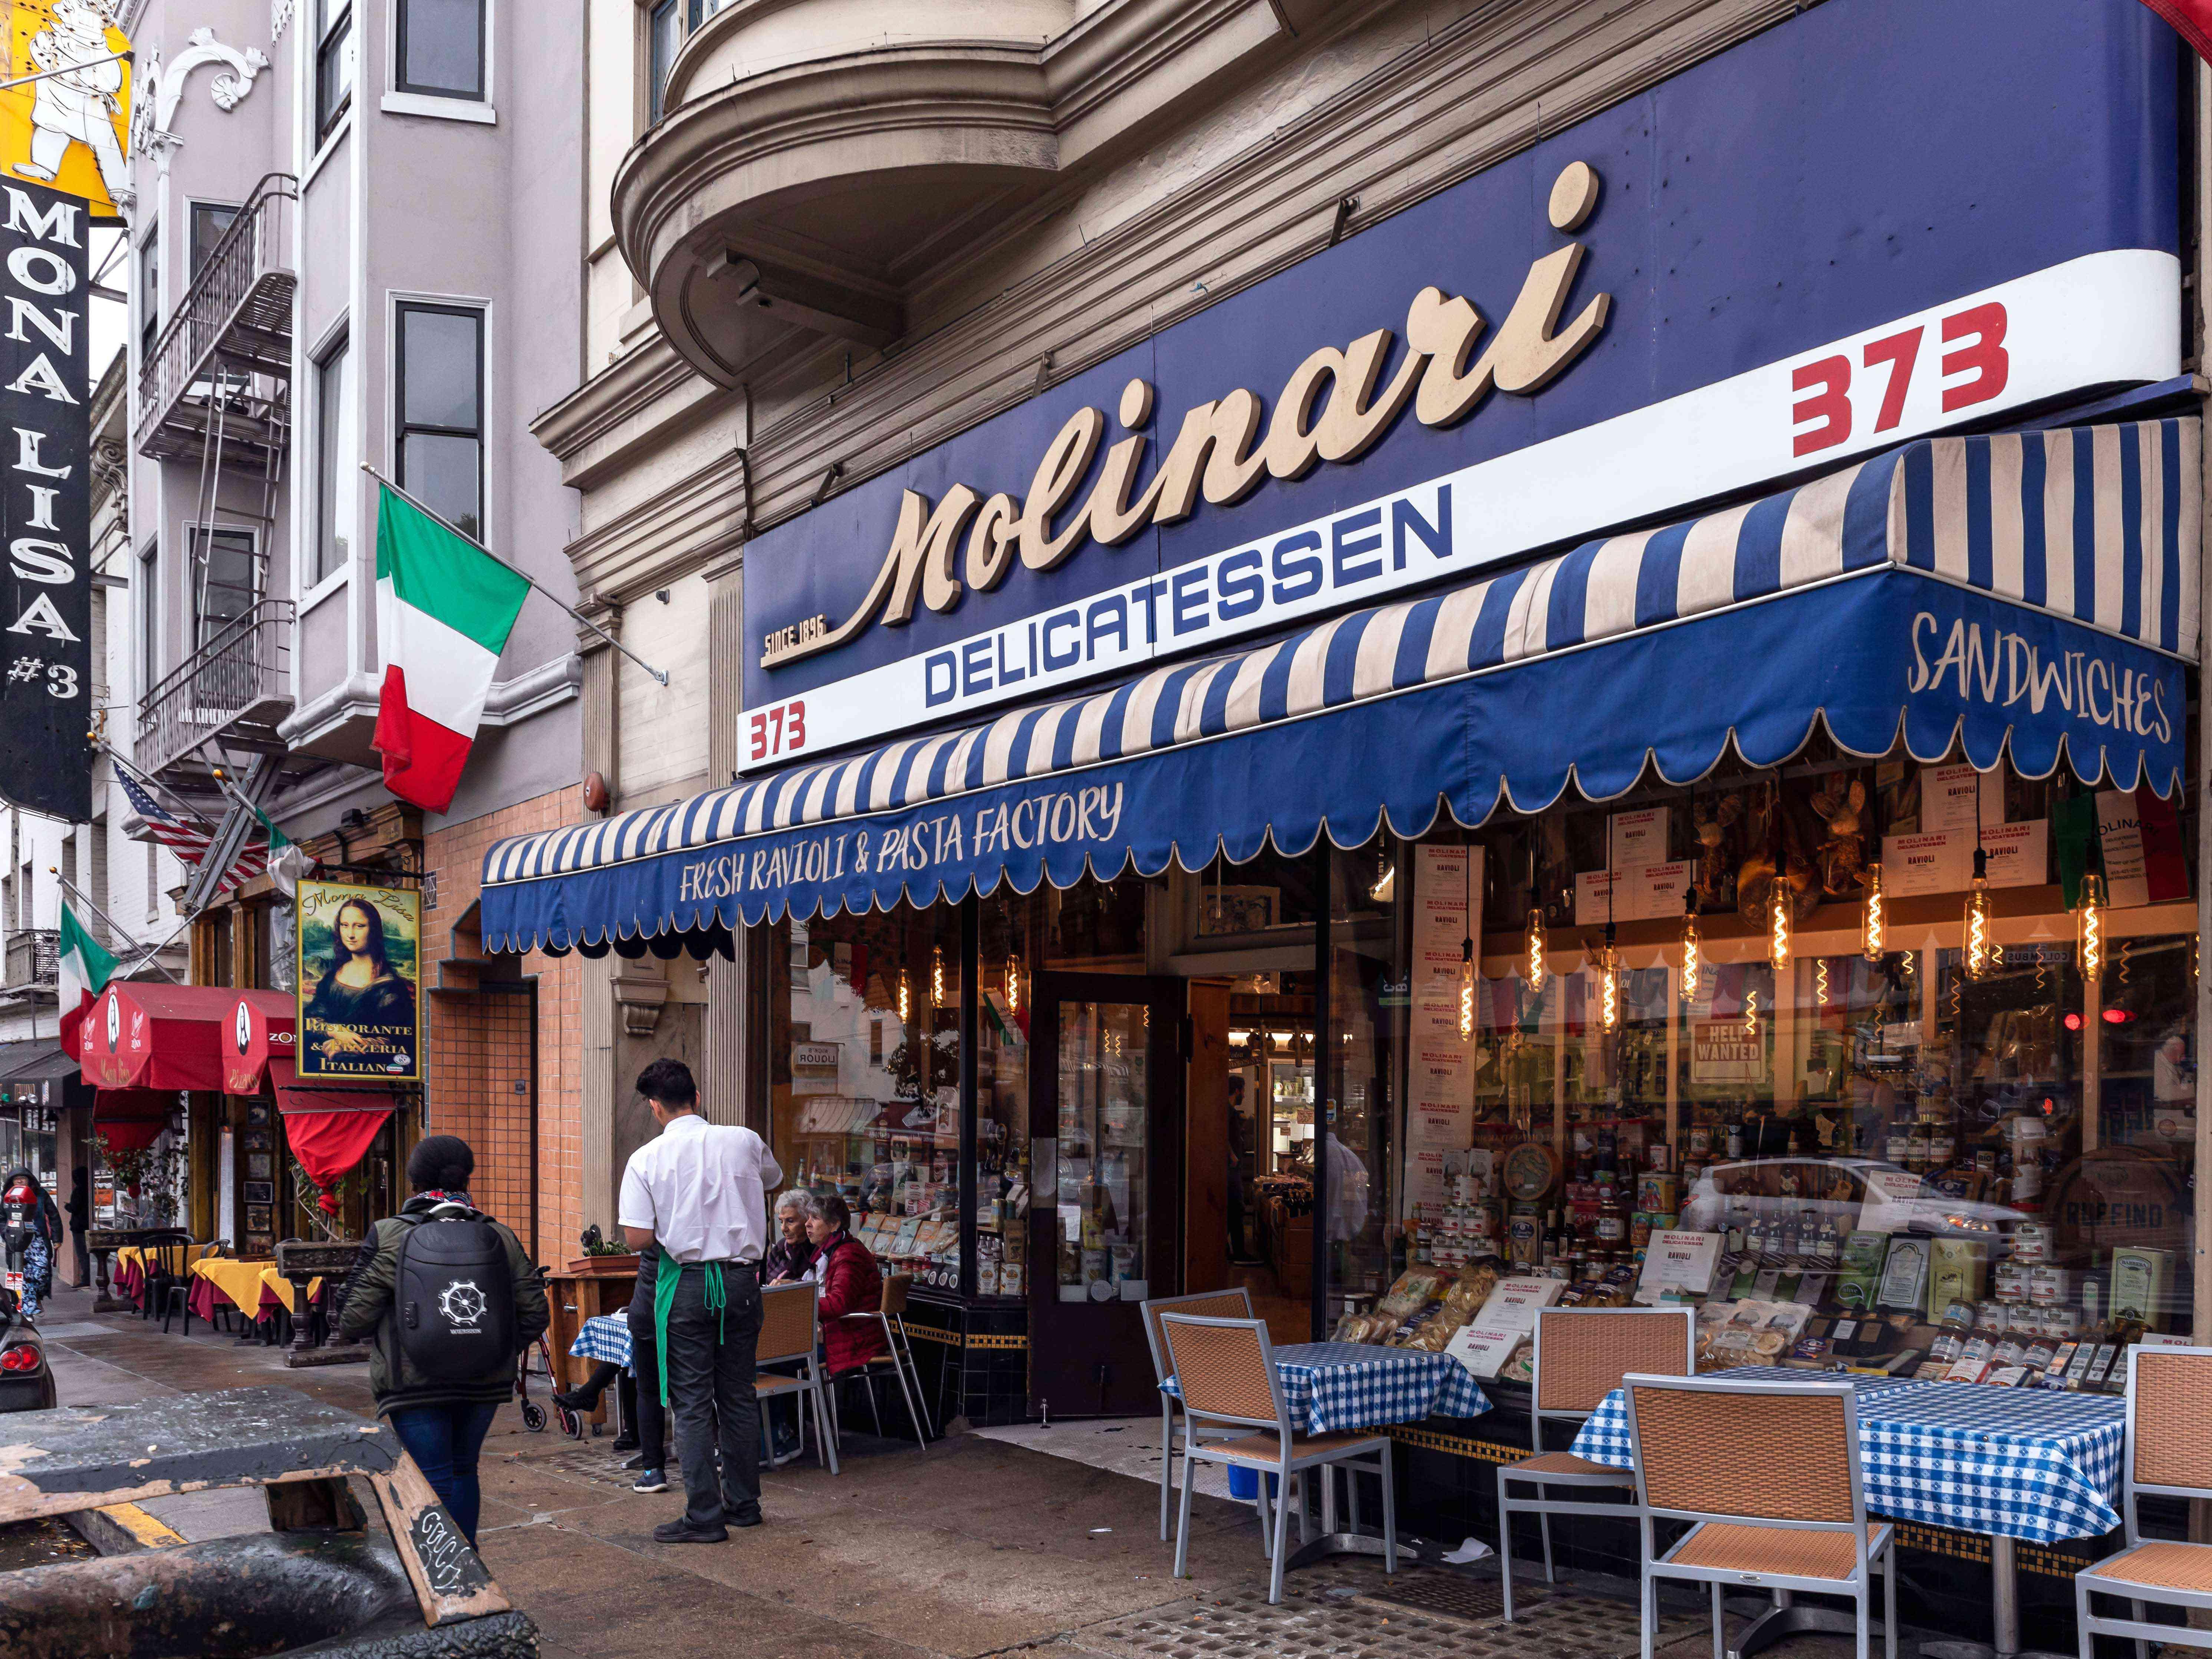 A traditional Italian restaurant on Columbus Ave